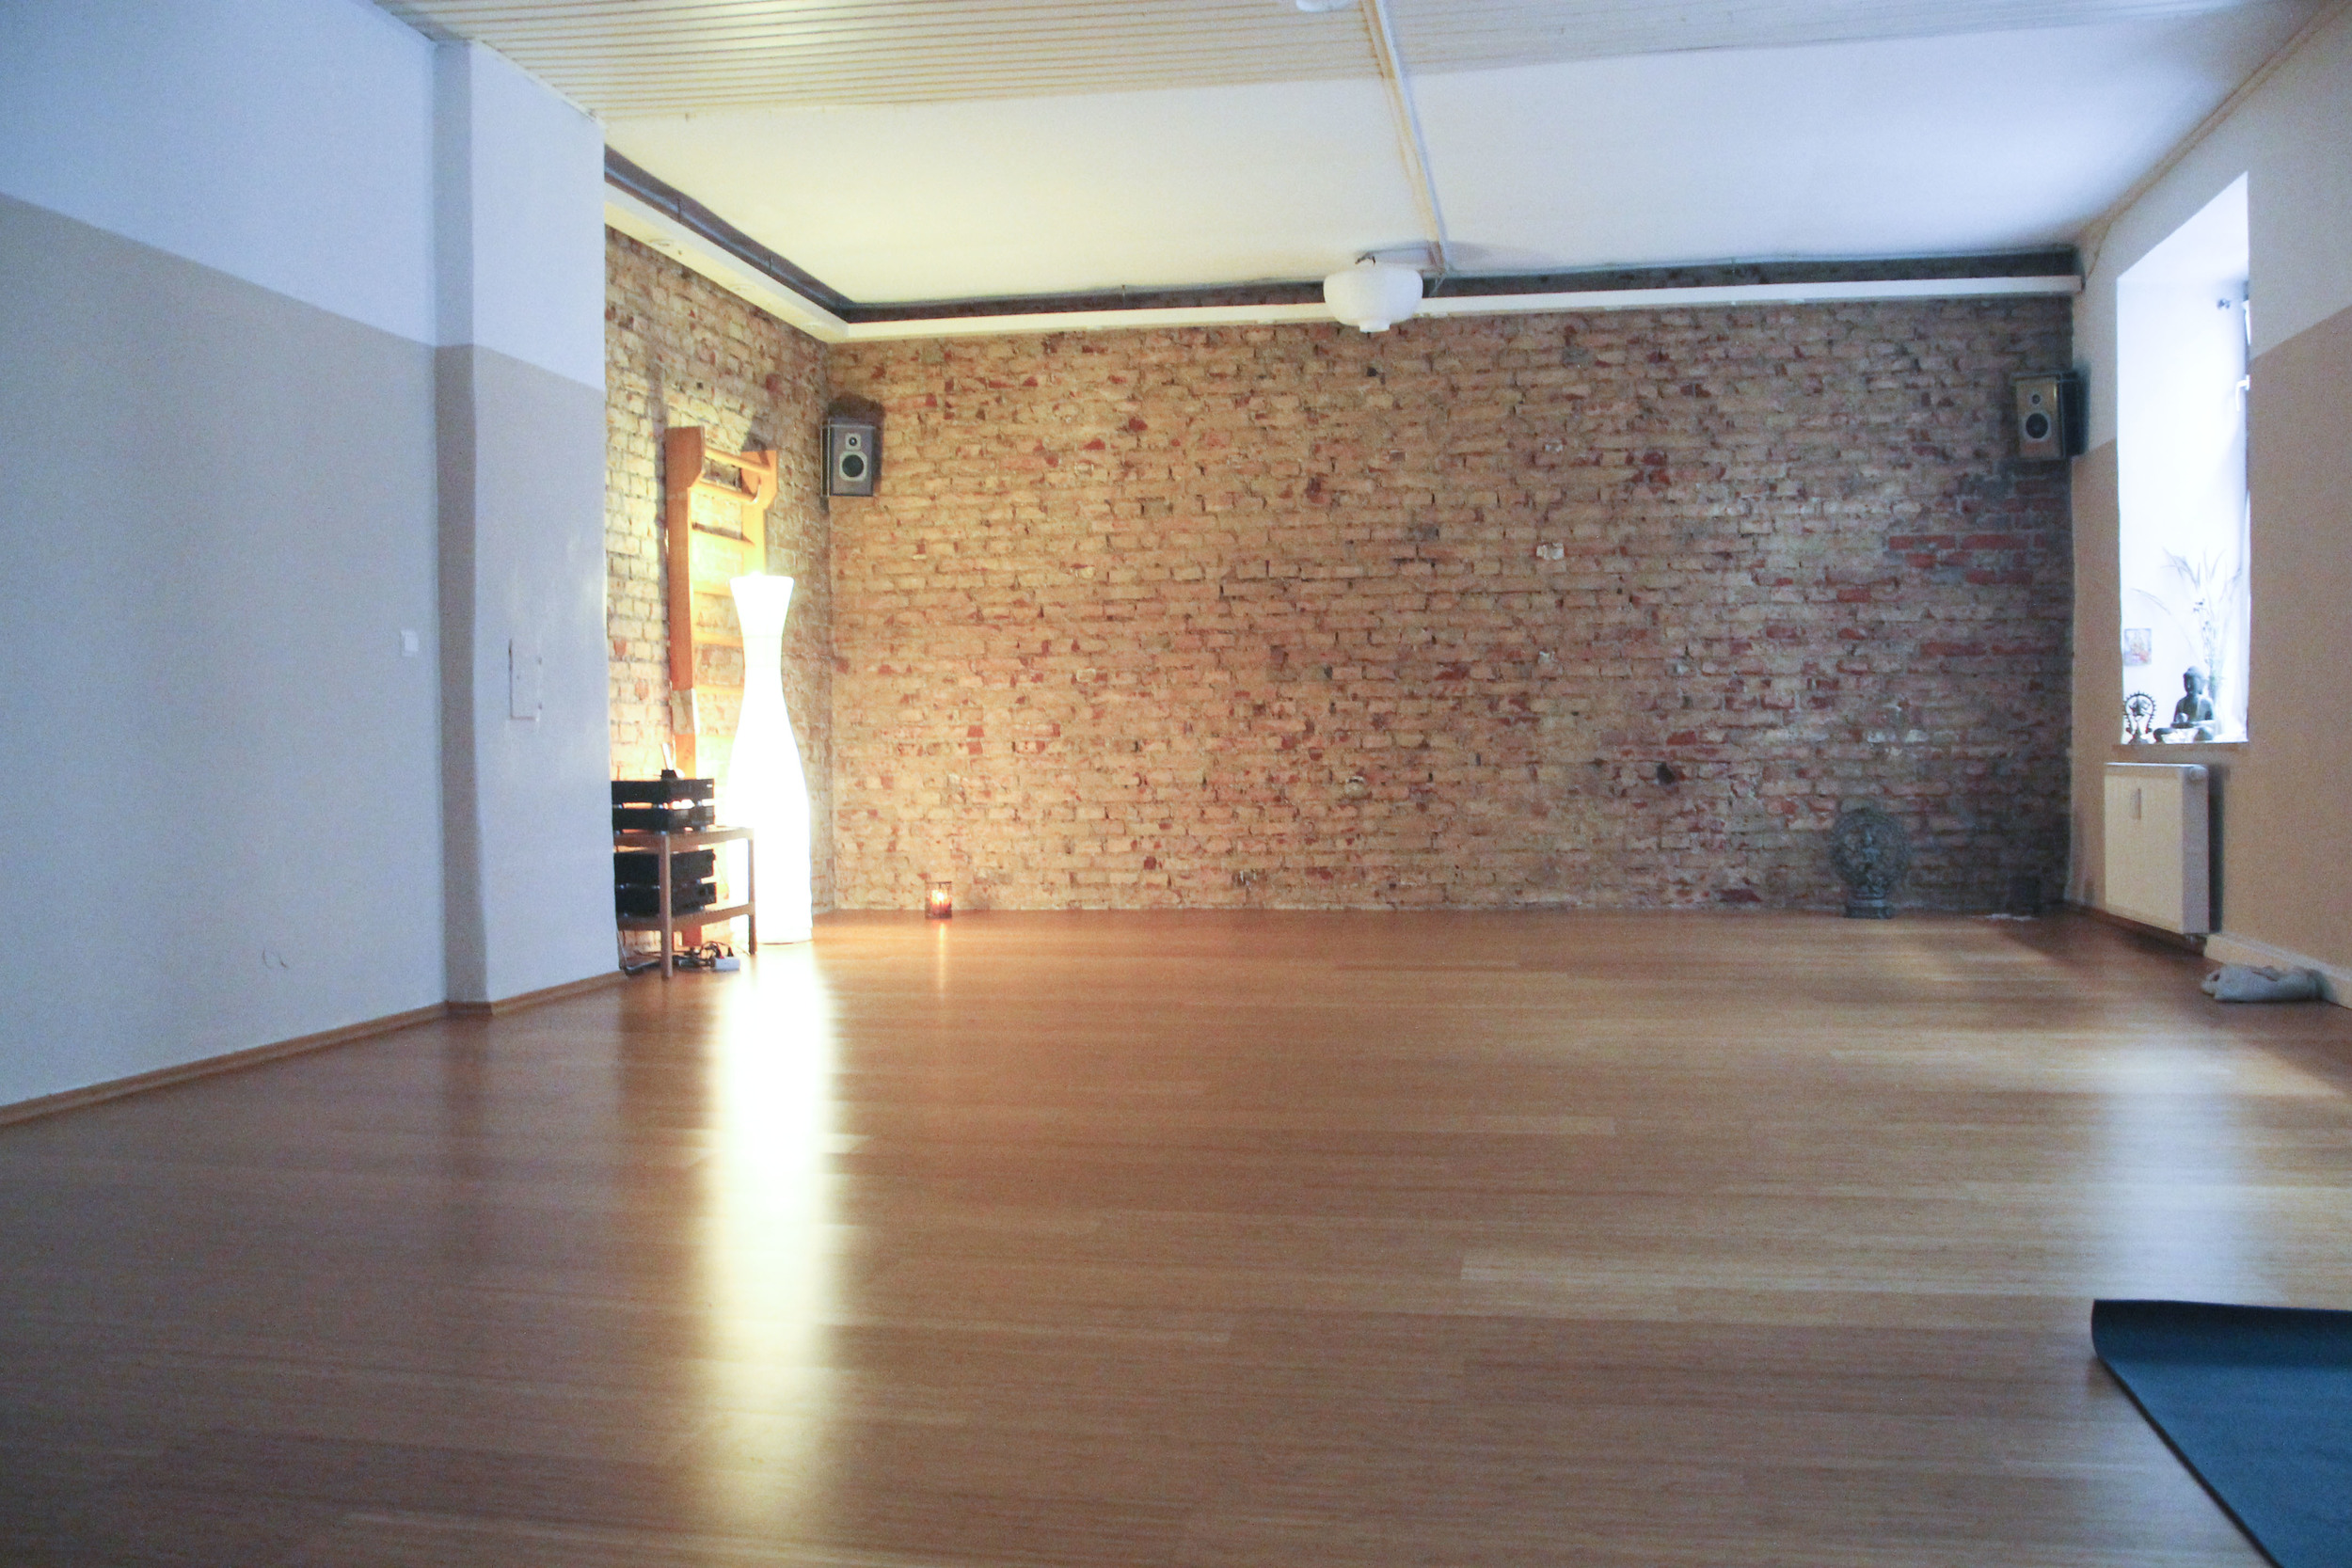 Jaya Yoga Studio Lena Kleiner1918.jpg